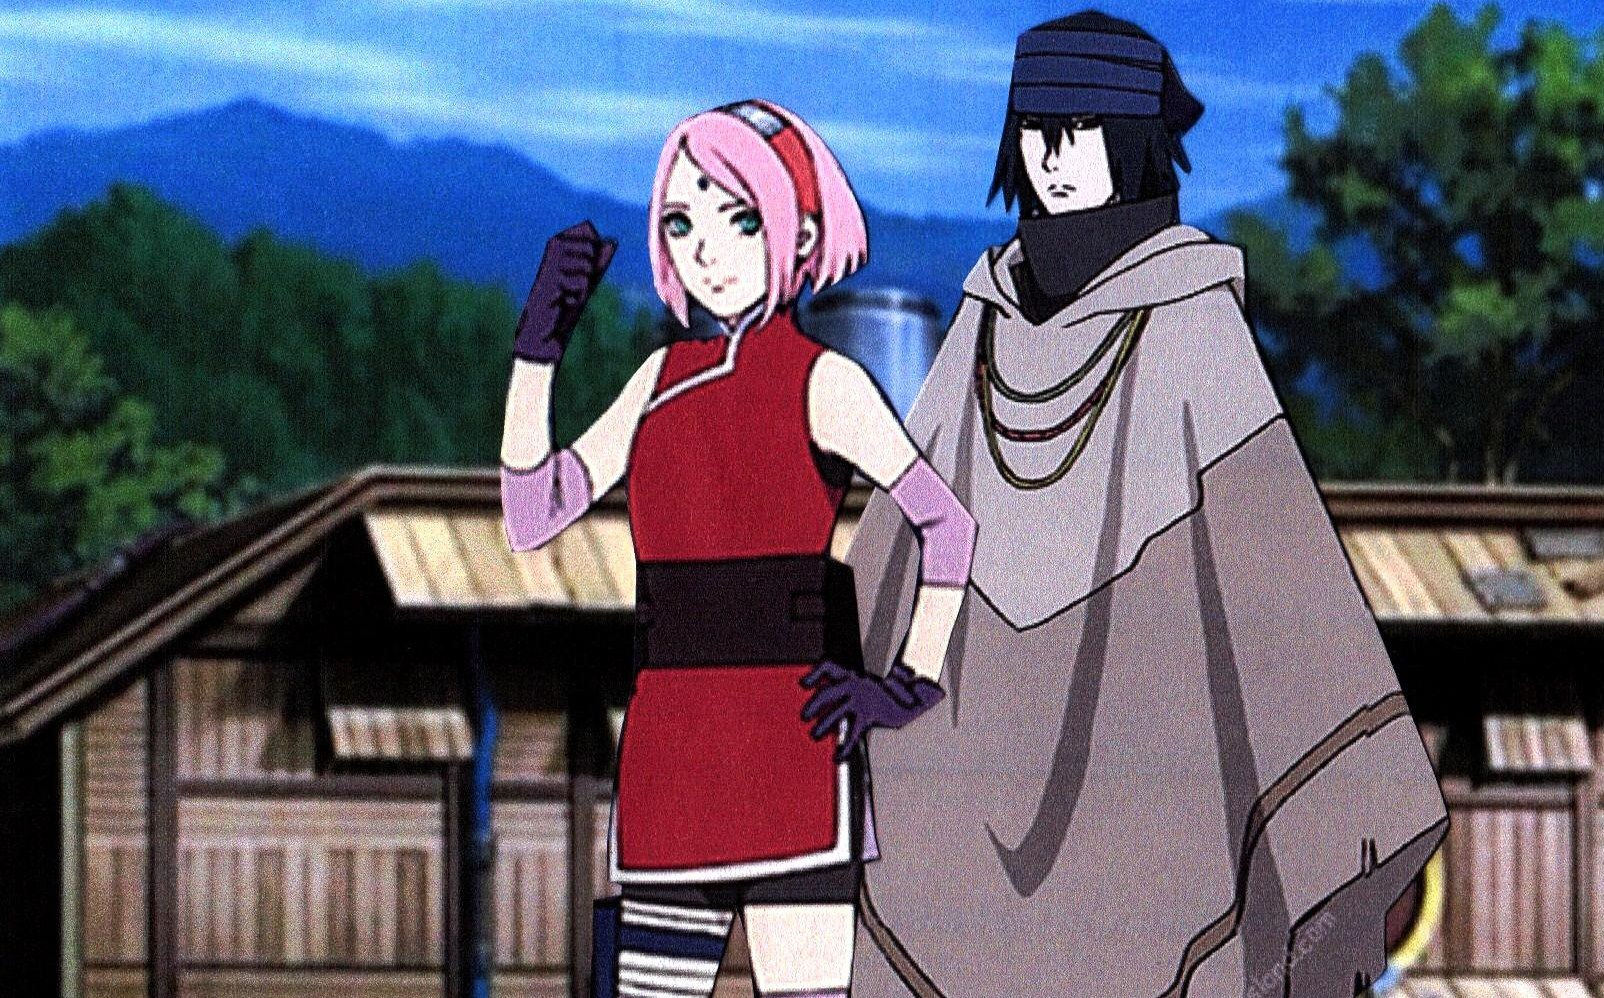 Sasuke And Sakura The Last Wallpaper By Weissdrum On Deviantart